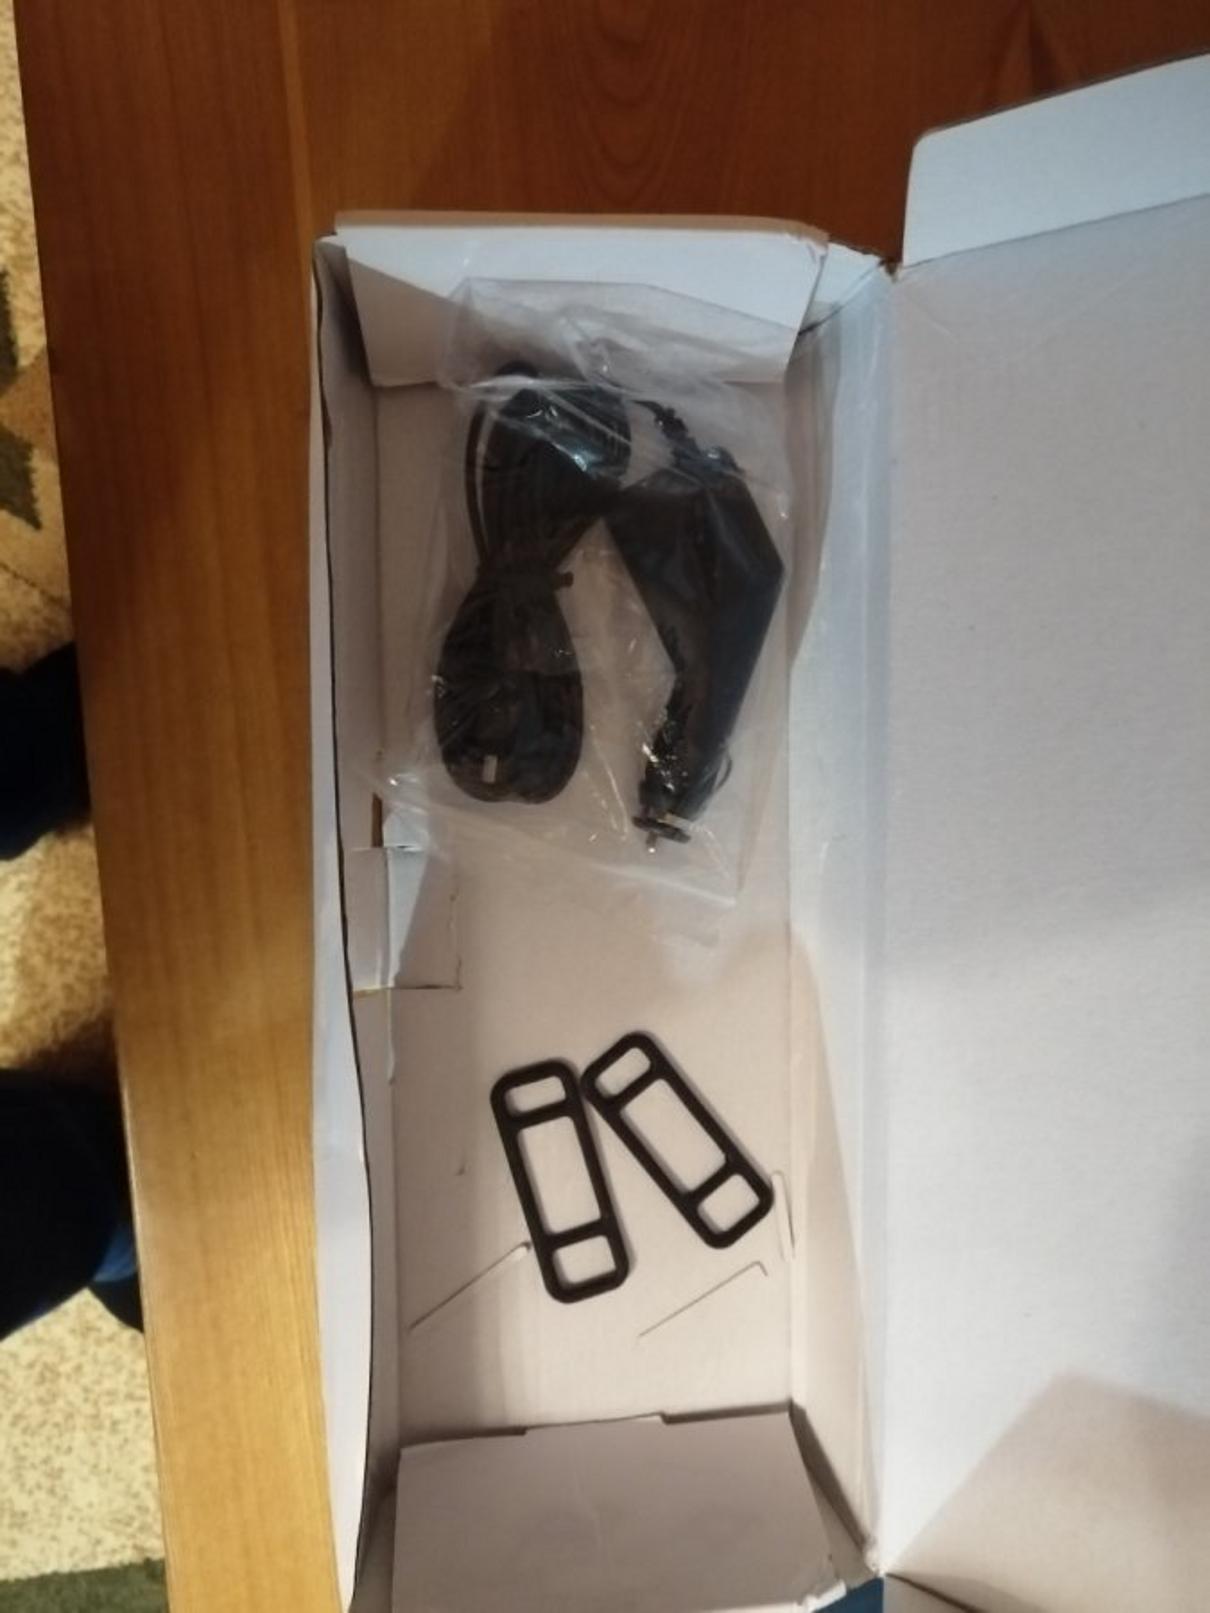 Жалоба-отзыв: Http://autoecho.xshopgood.com/r1 - Товар не соответствует заказу.  Фото №2